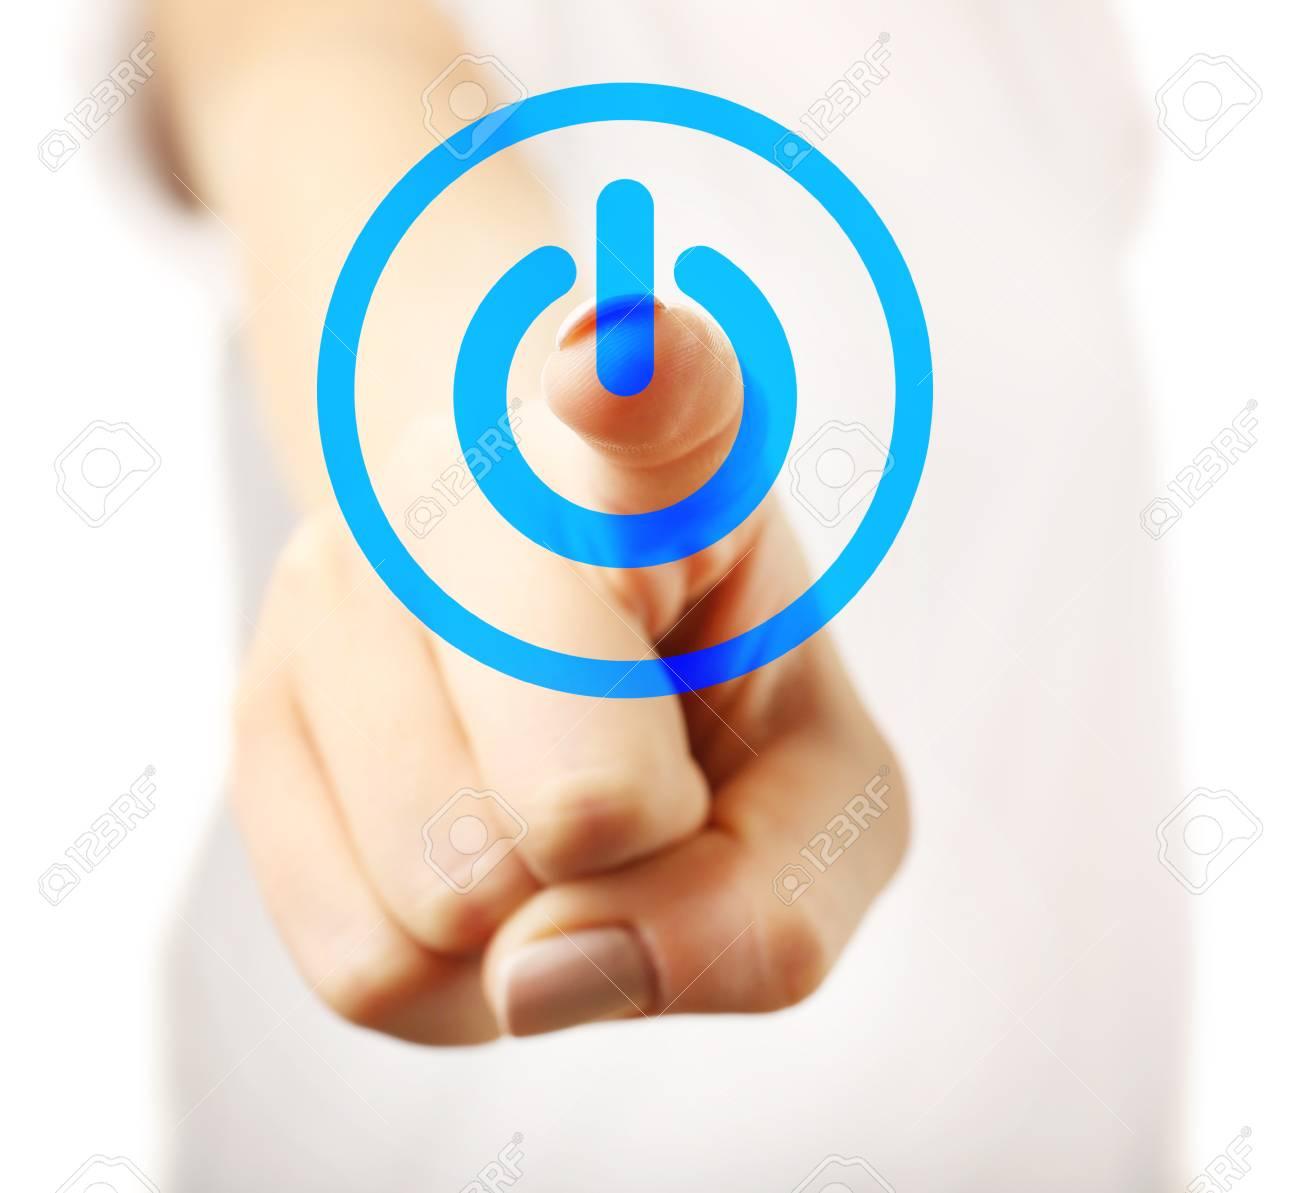 Finger press power button on virtual touch screen, modern technology